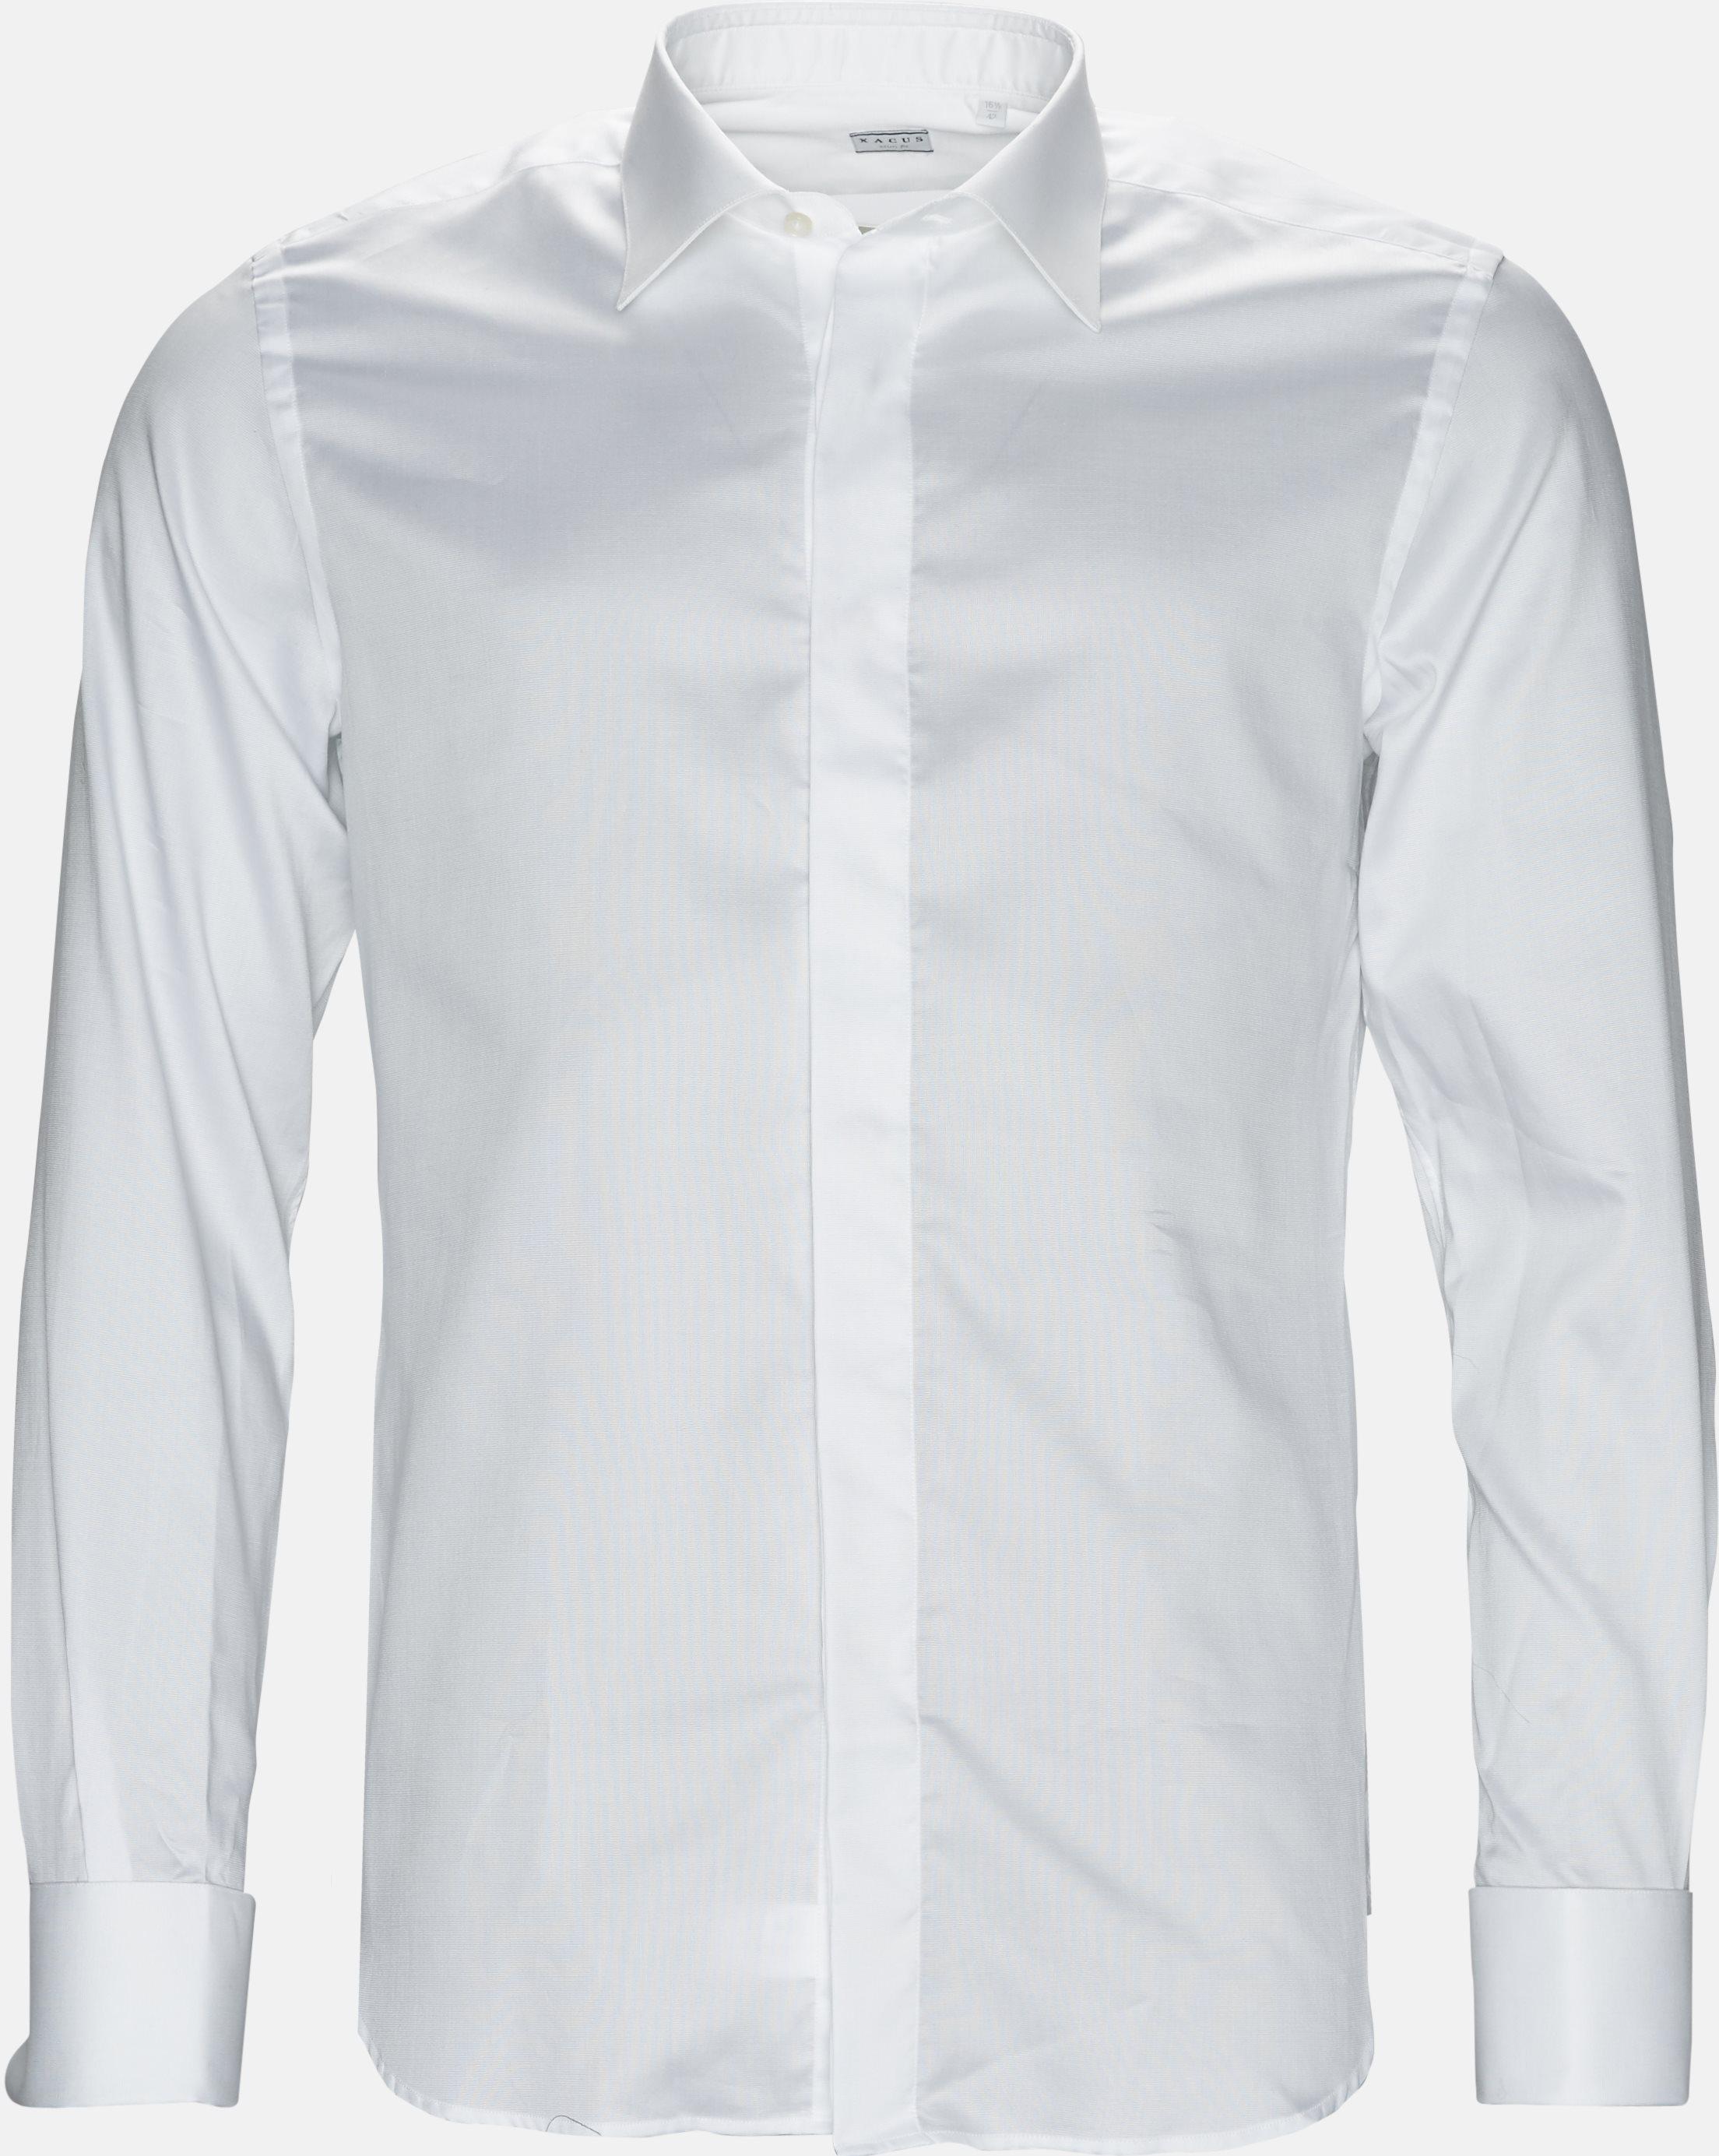 11277 644 skjorte - Skjorter - Slim - Hvid